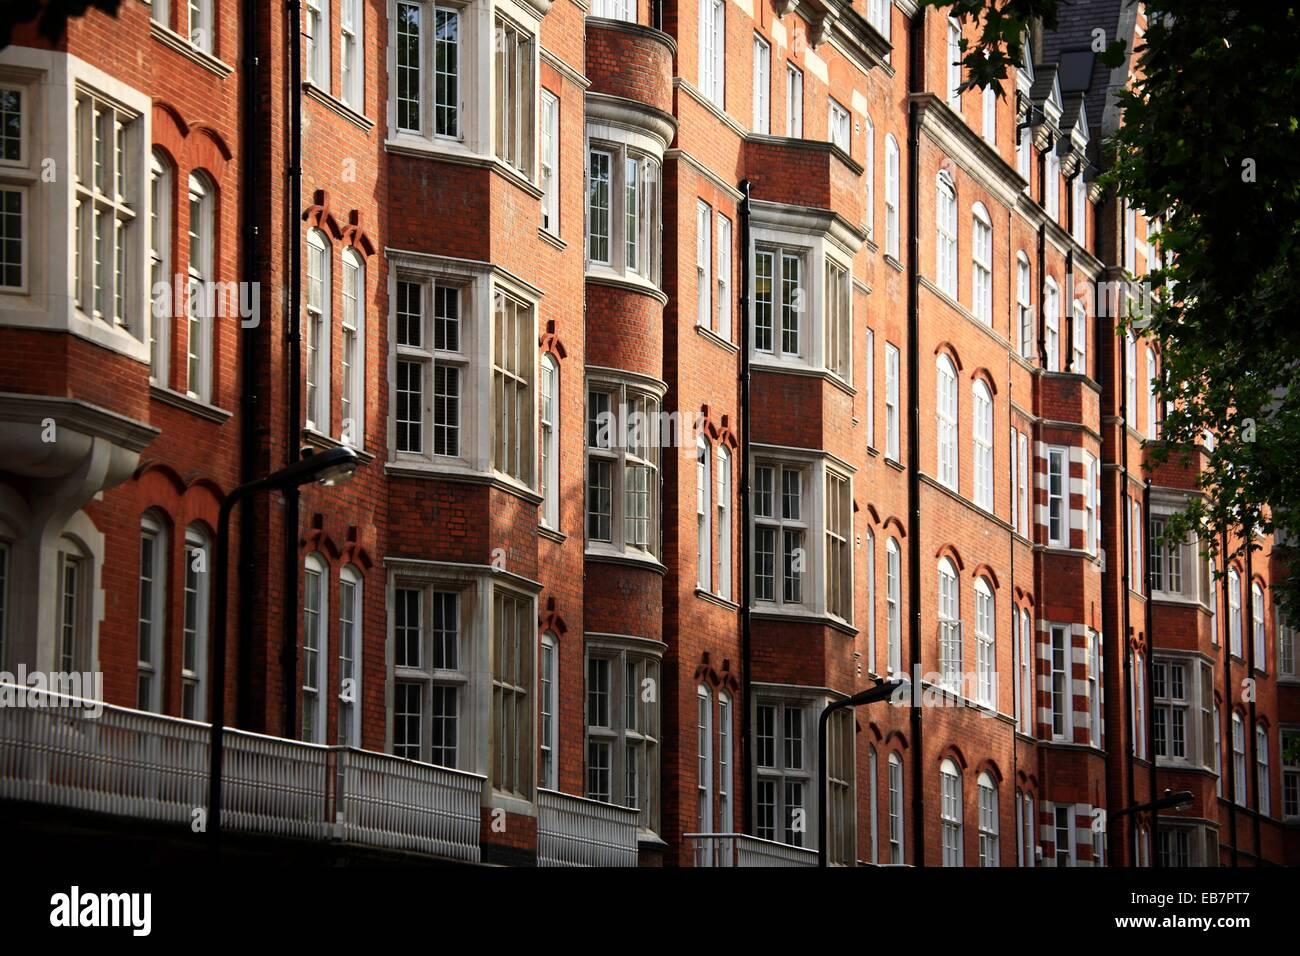 https://c8.alamy.com/comp/EB7PT7/traditional-apartment-buildings-in-west-london-england-uk-EB7PT7.jpg